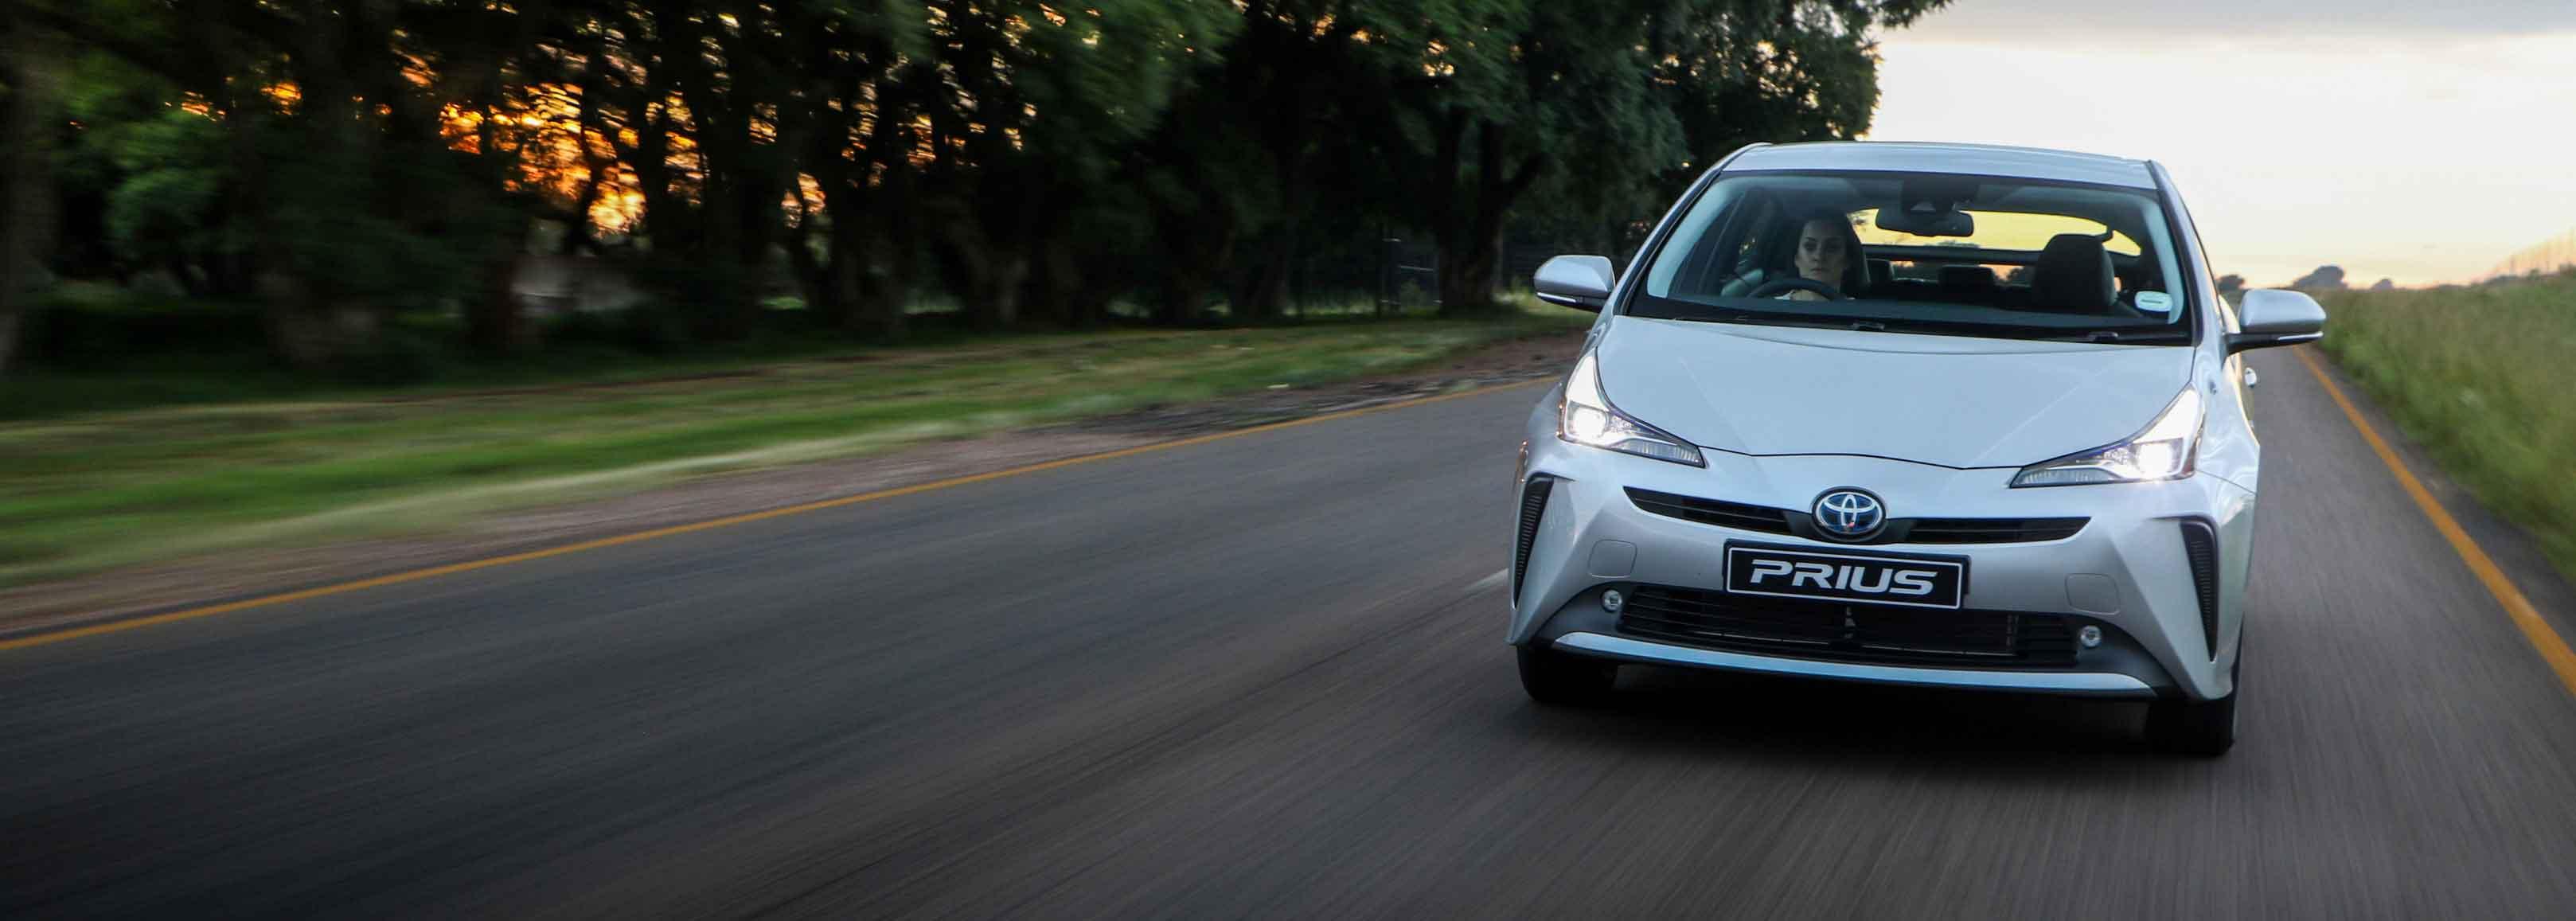 Toyota Prius updated